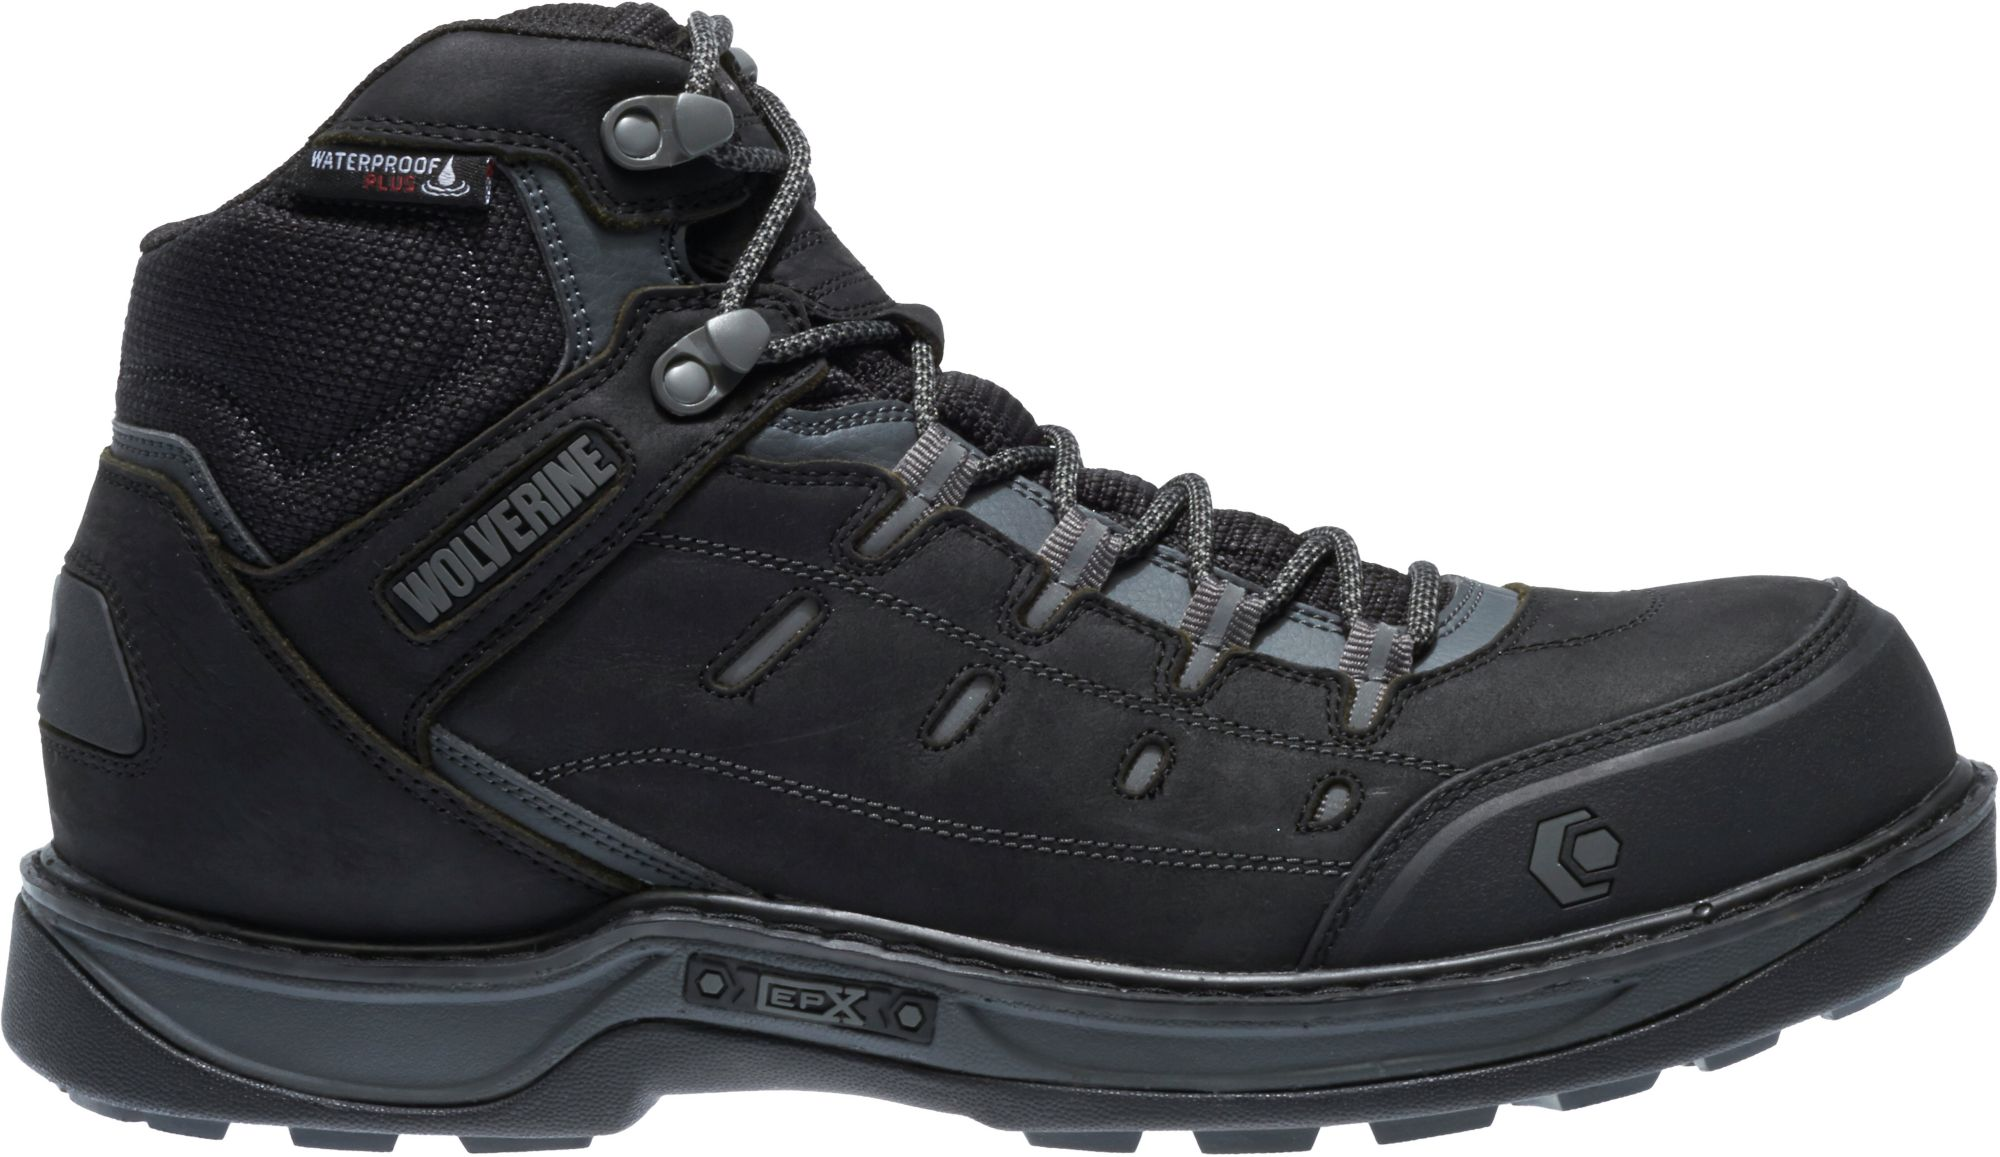 b182c4bd975 Wolverine Men's Edge LX EPX CarbonMax Work Boots